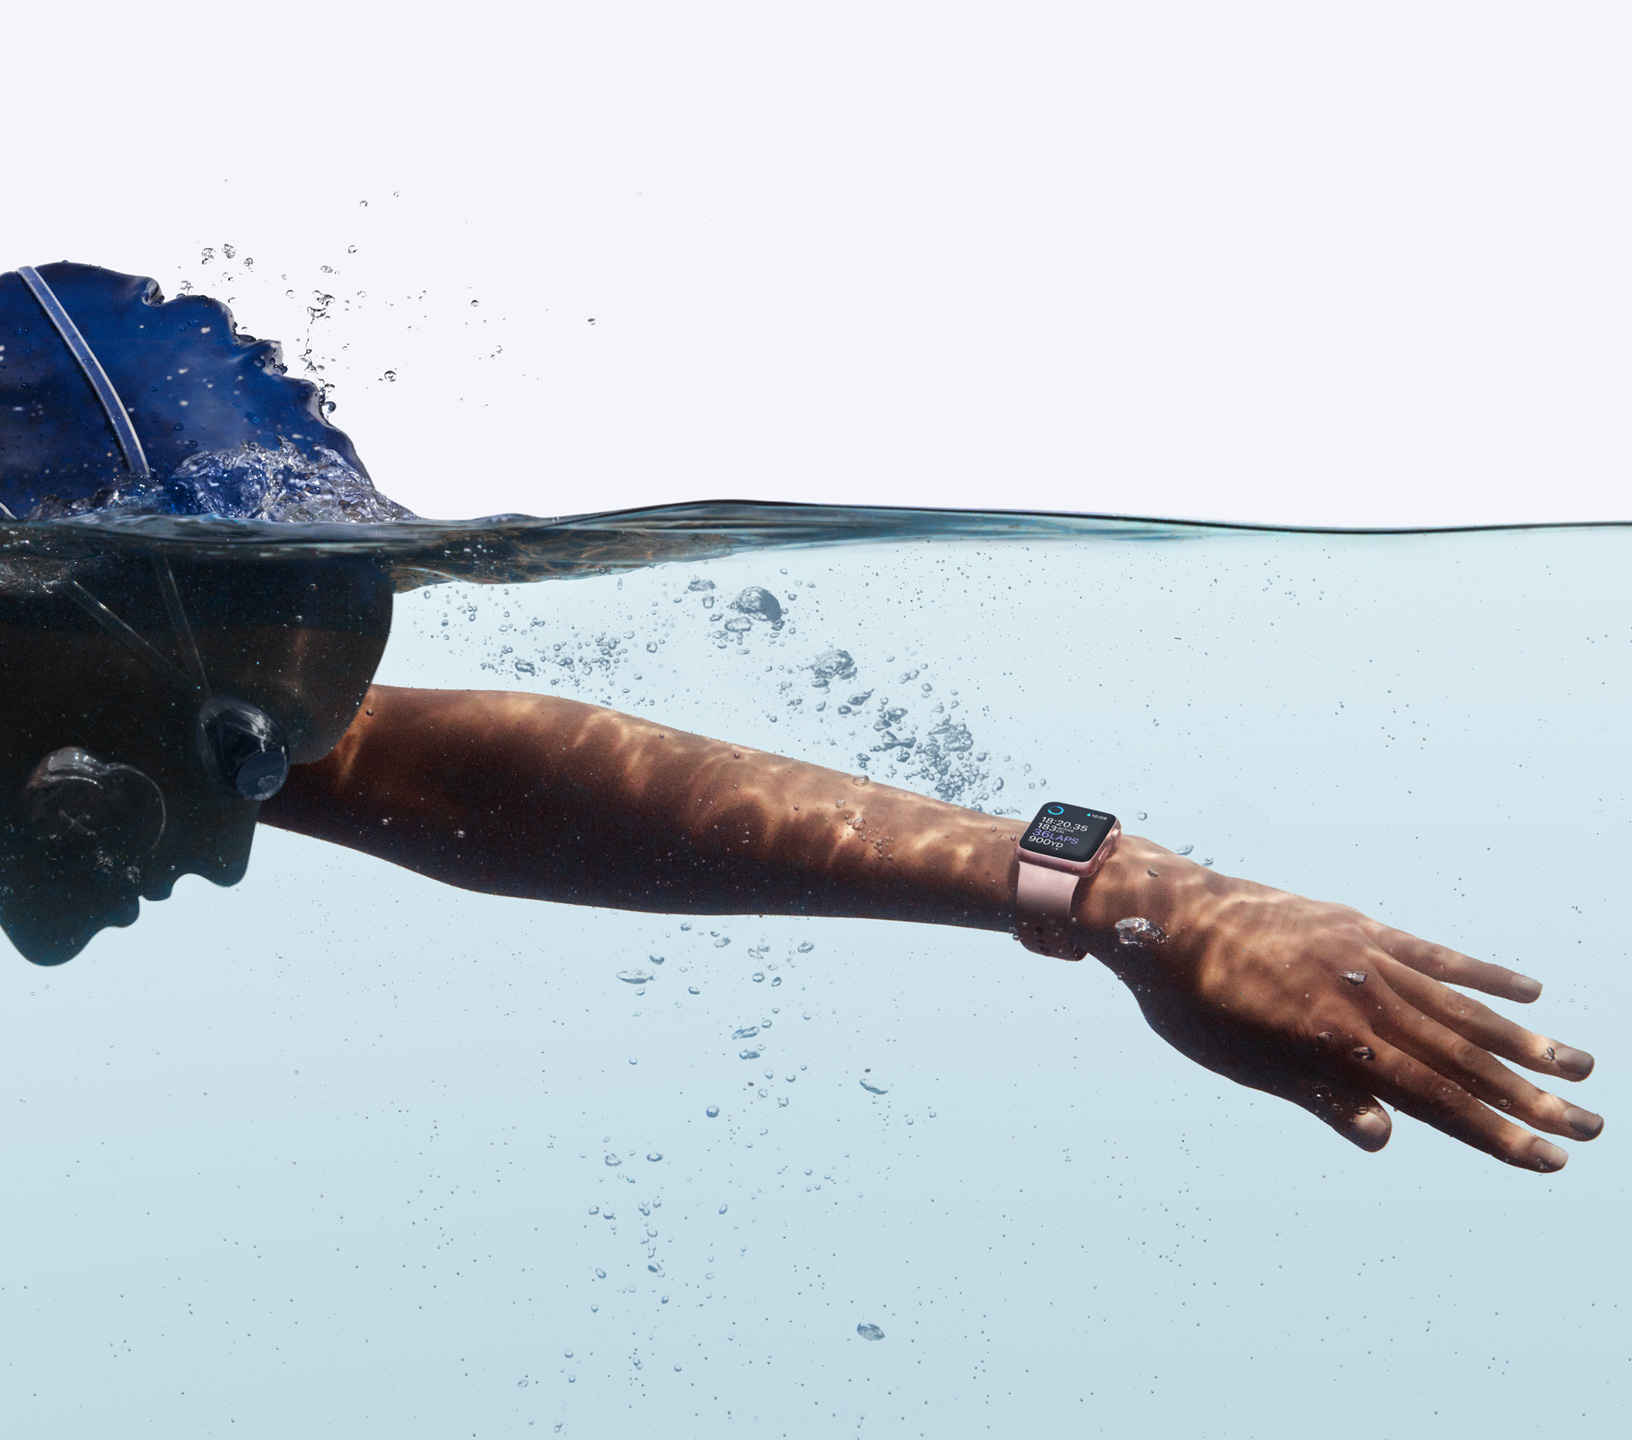 apple-watch2-swimming.jpg